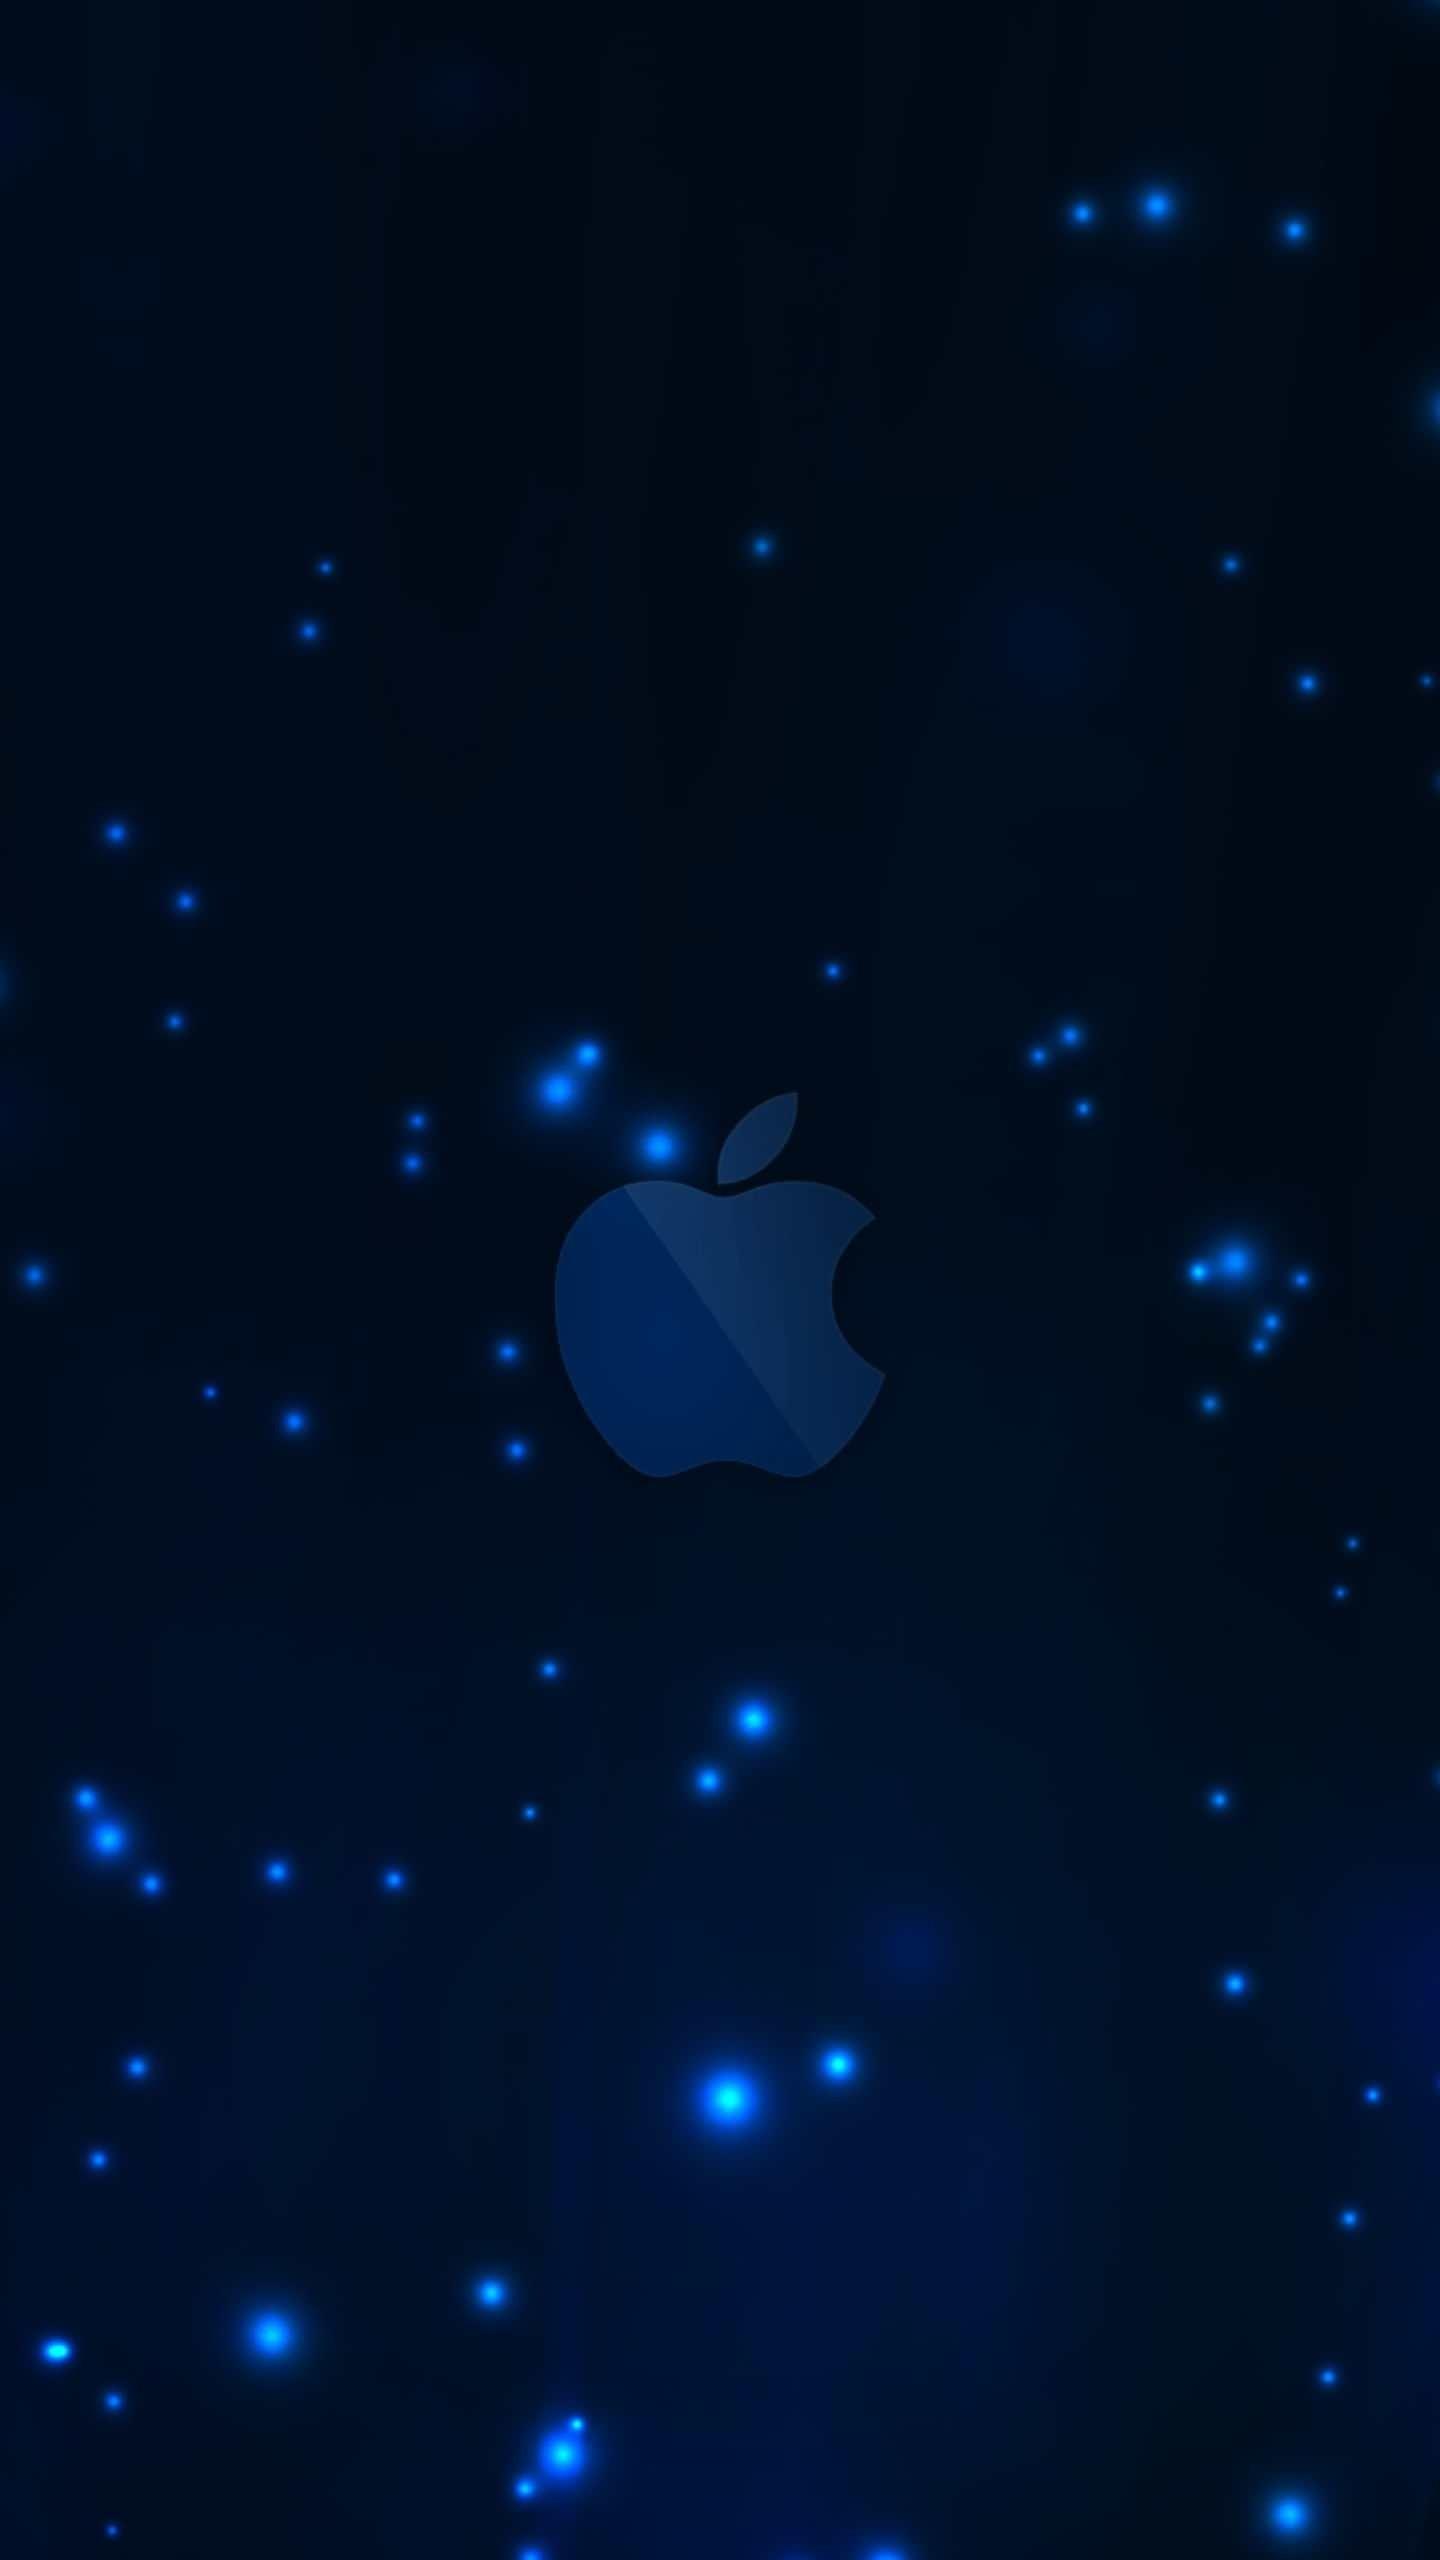 Apple blue | wallpaper.sc SmartPhone